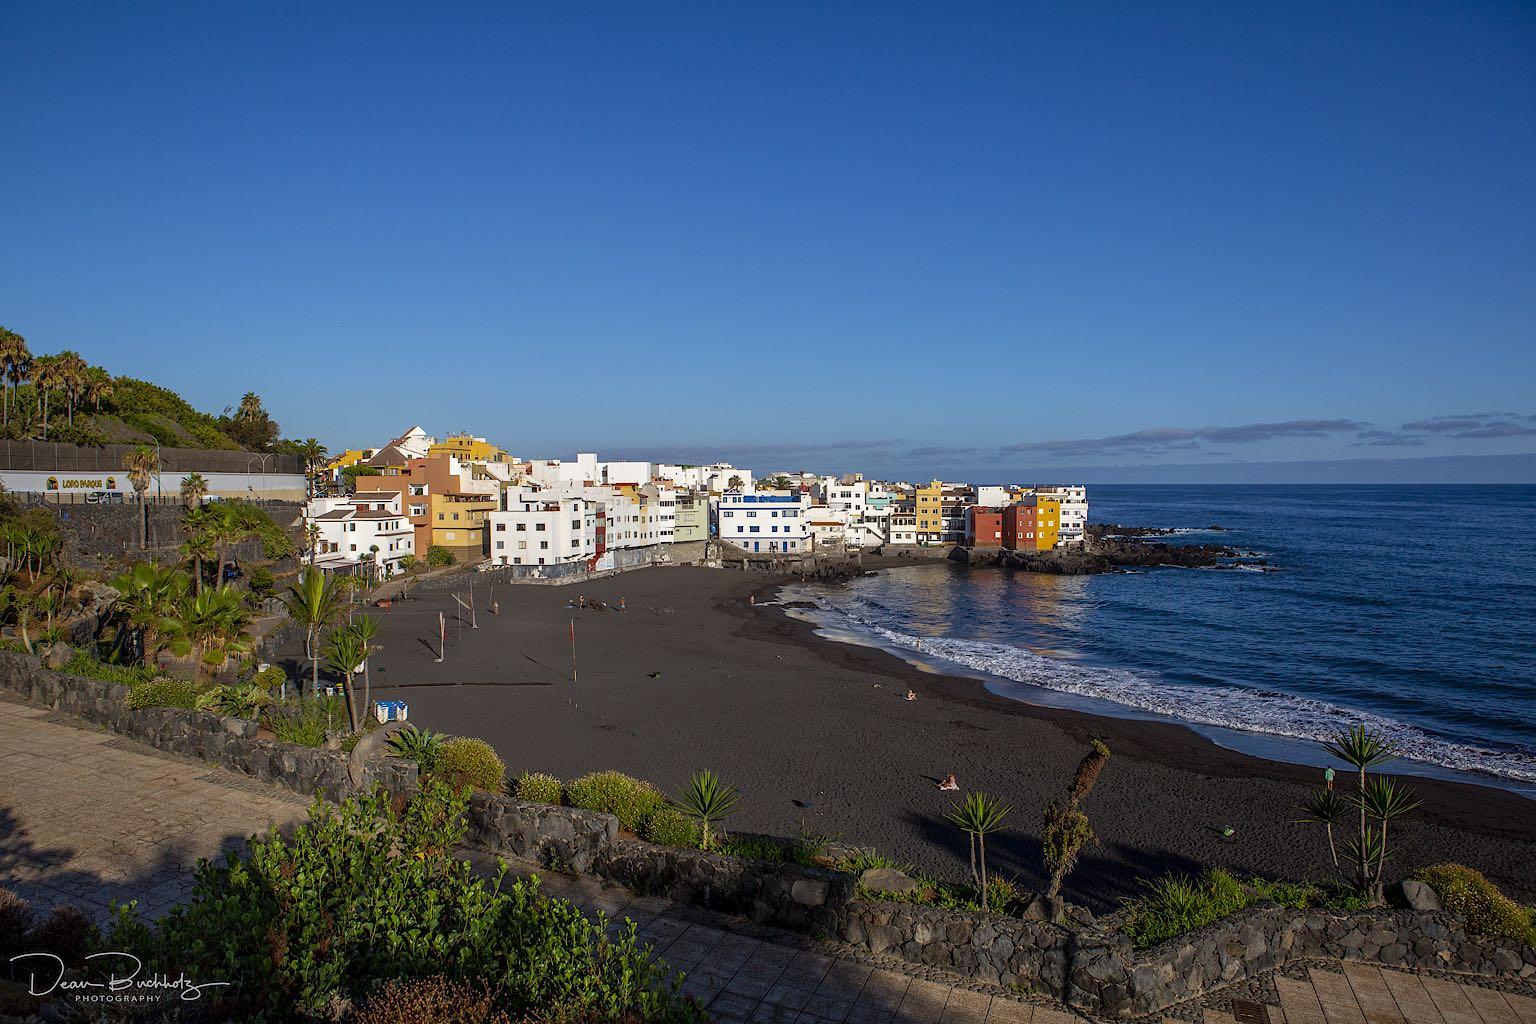 Teneriffa 2019 – Puerto de la Cruz